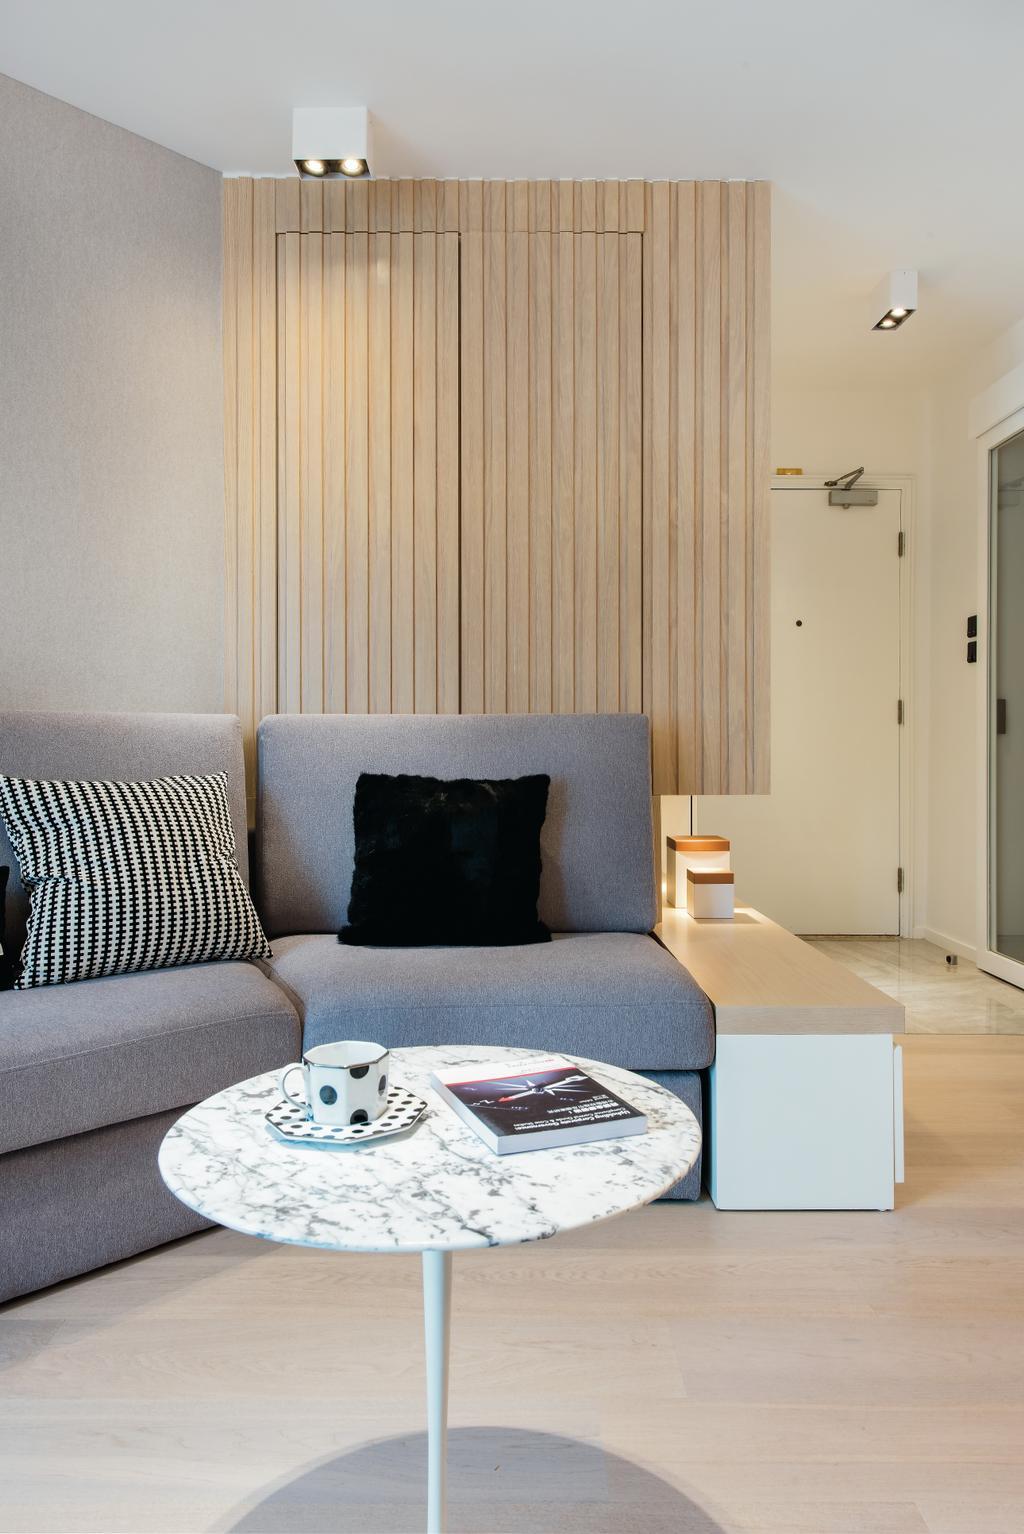 私家樓, 客廳, 港運城 (Island Place), 室內設計師, Space Design, Couch, Furniture